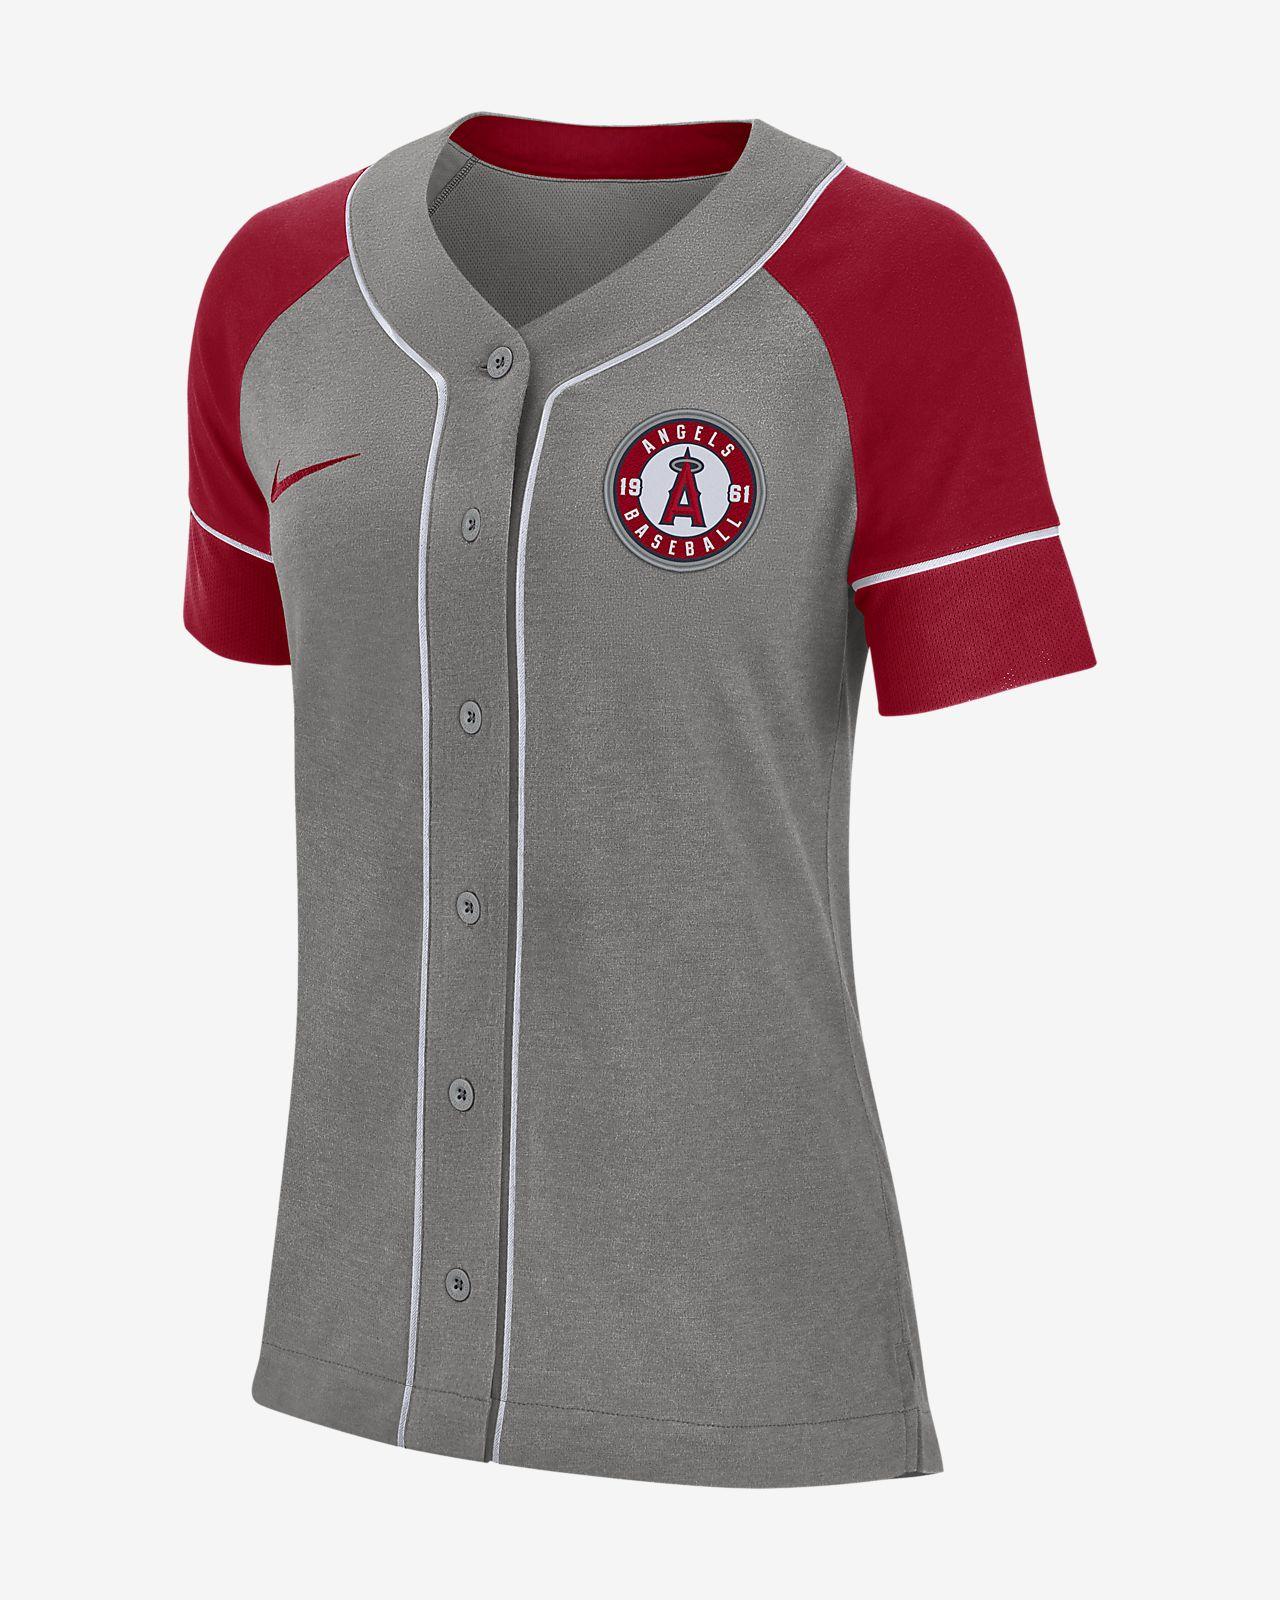 Nike Dri-FIT (MLB Angels) Women s Baseball Jersey. Nike.com 8a843a6d7